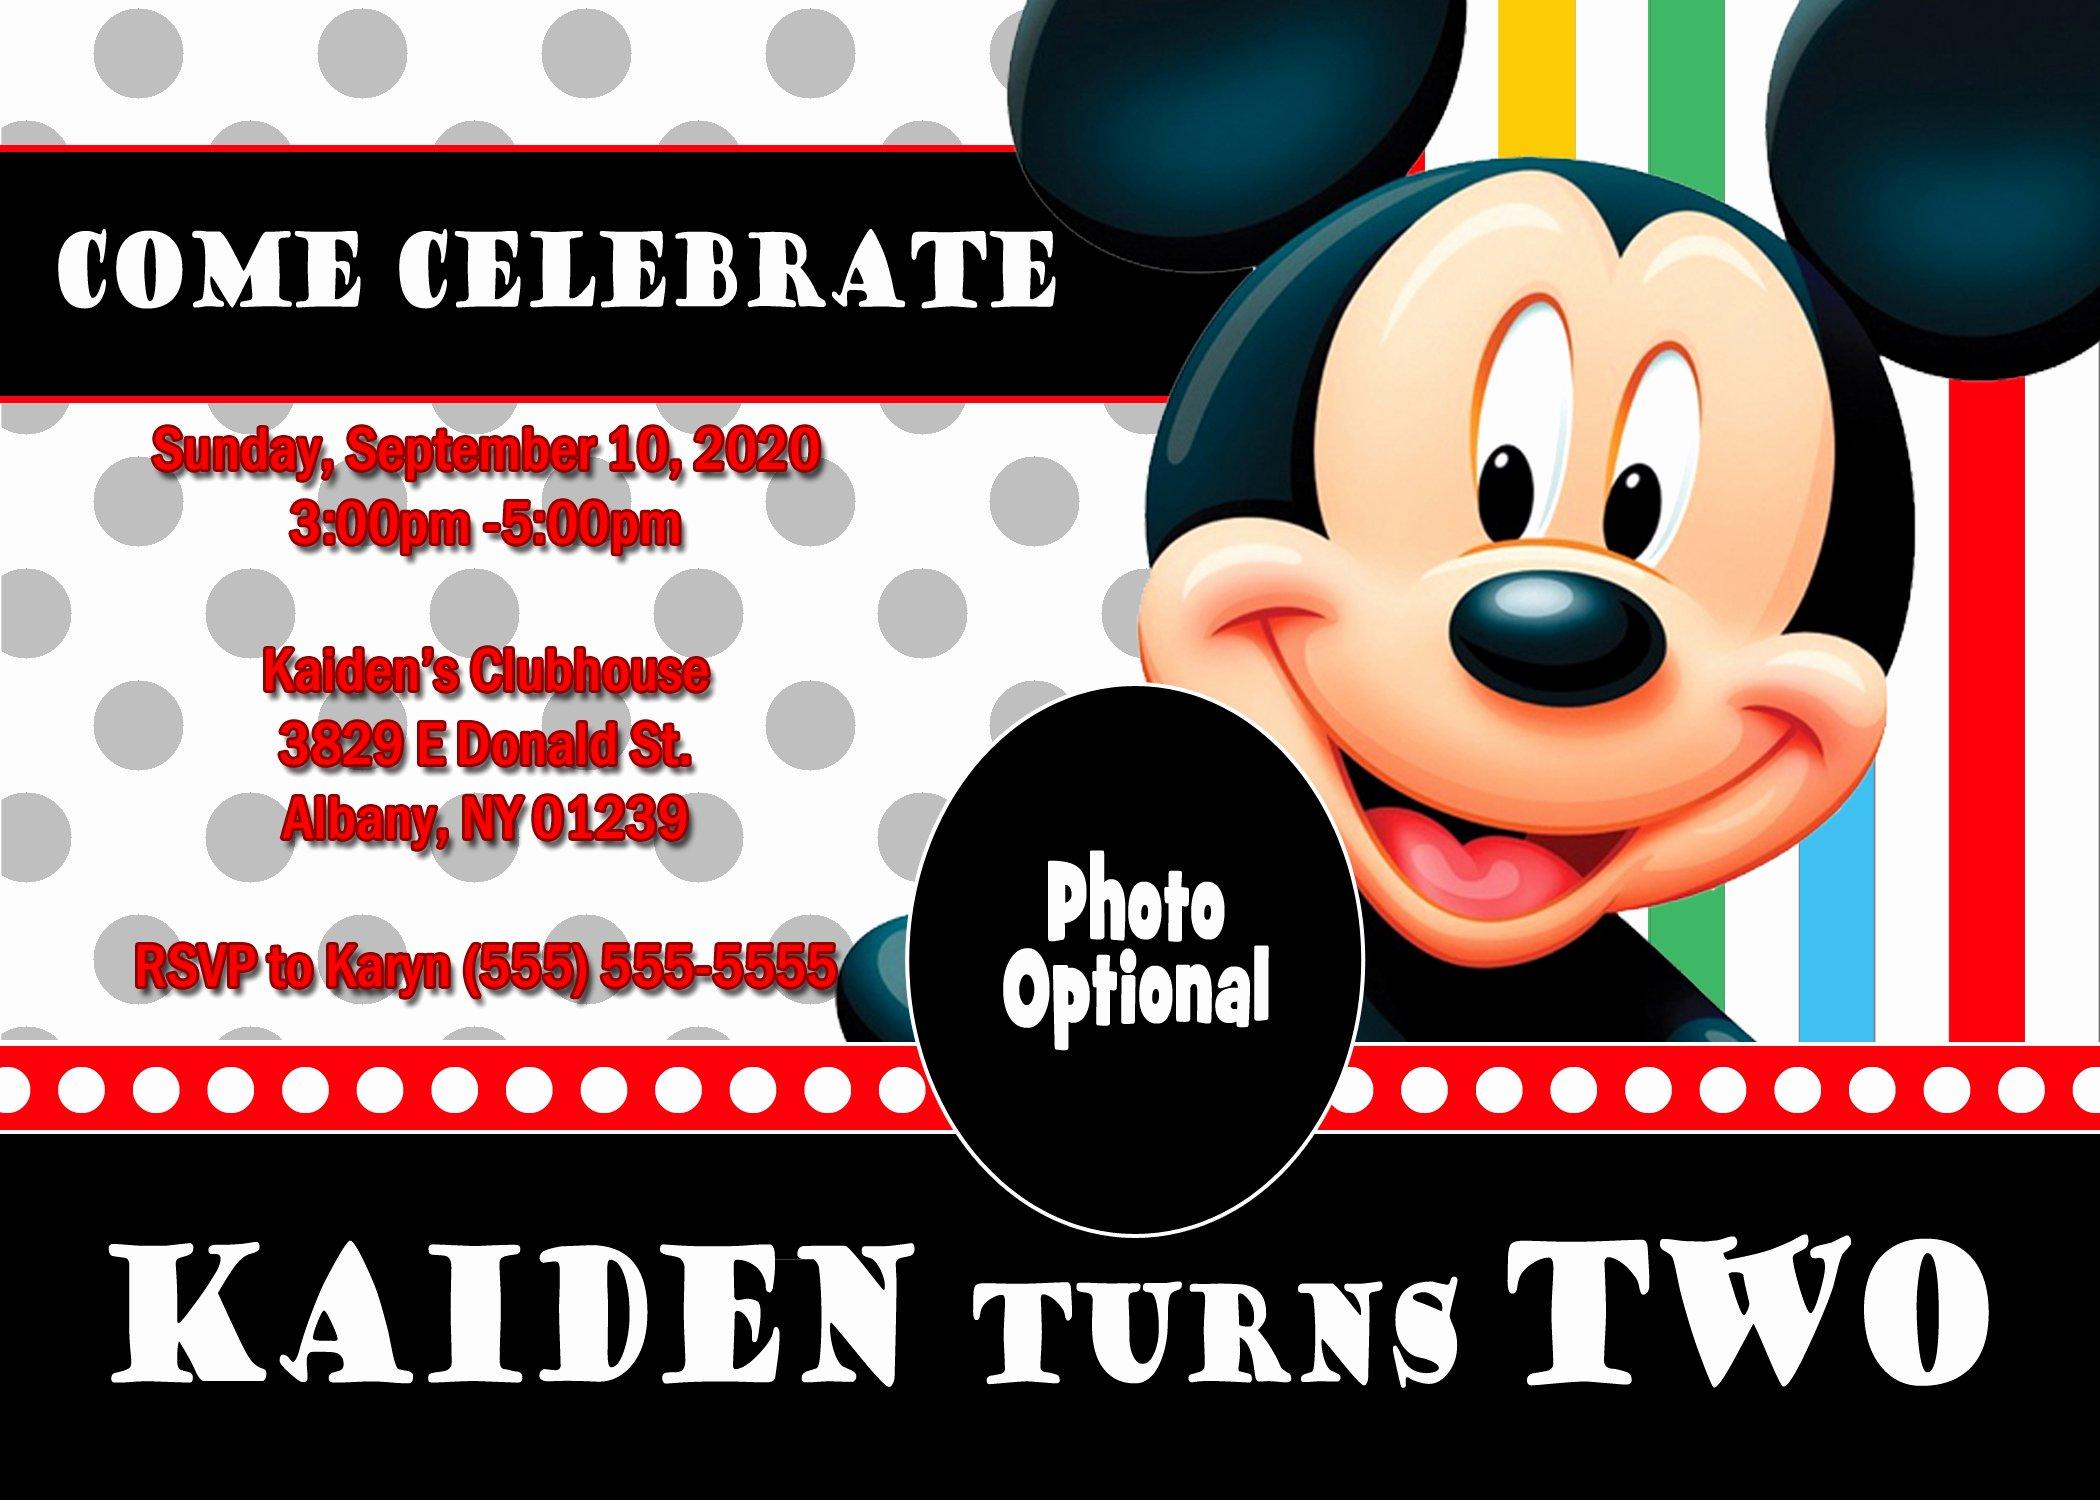 Mickey Mouse Birthday Party Invitations Lovely Mickey Mouse and Mickey Mouse Clubhouse Birthday Invitations